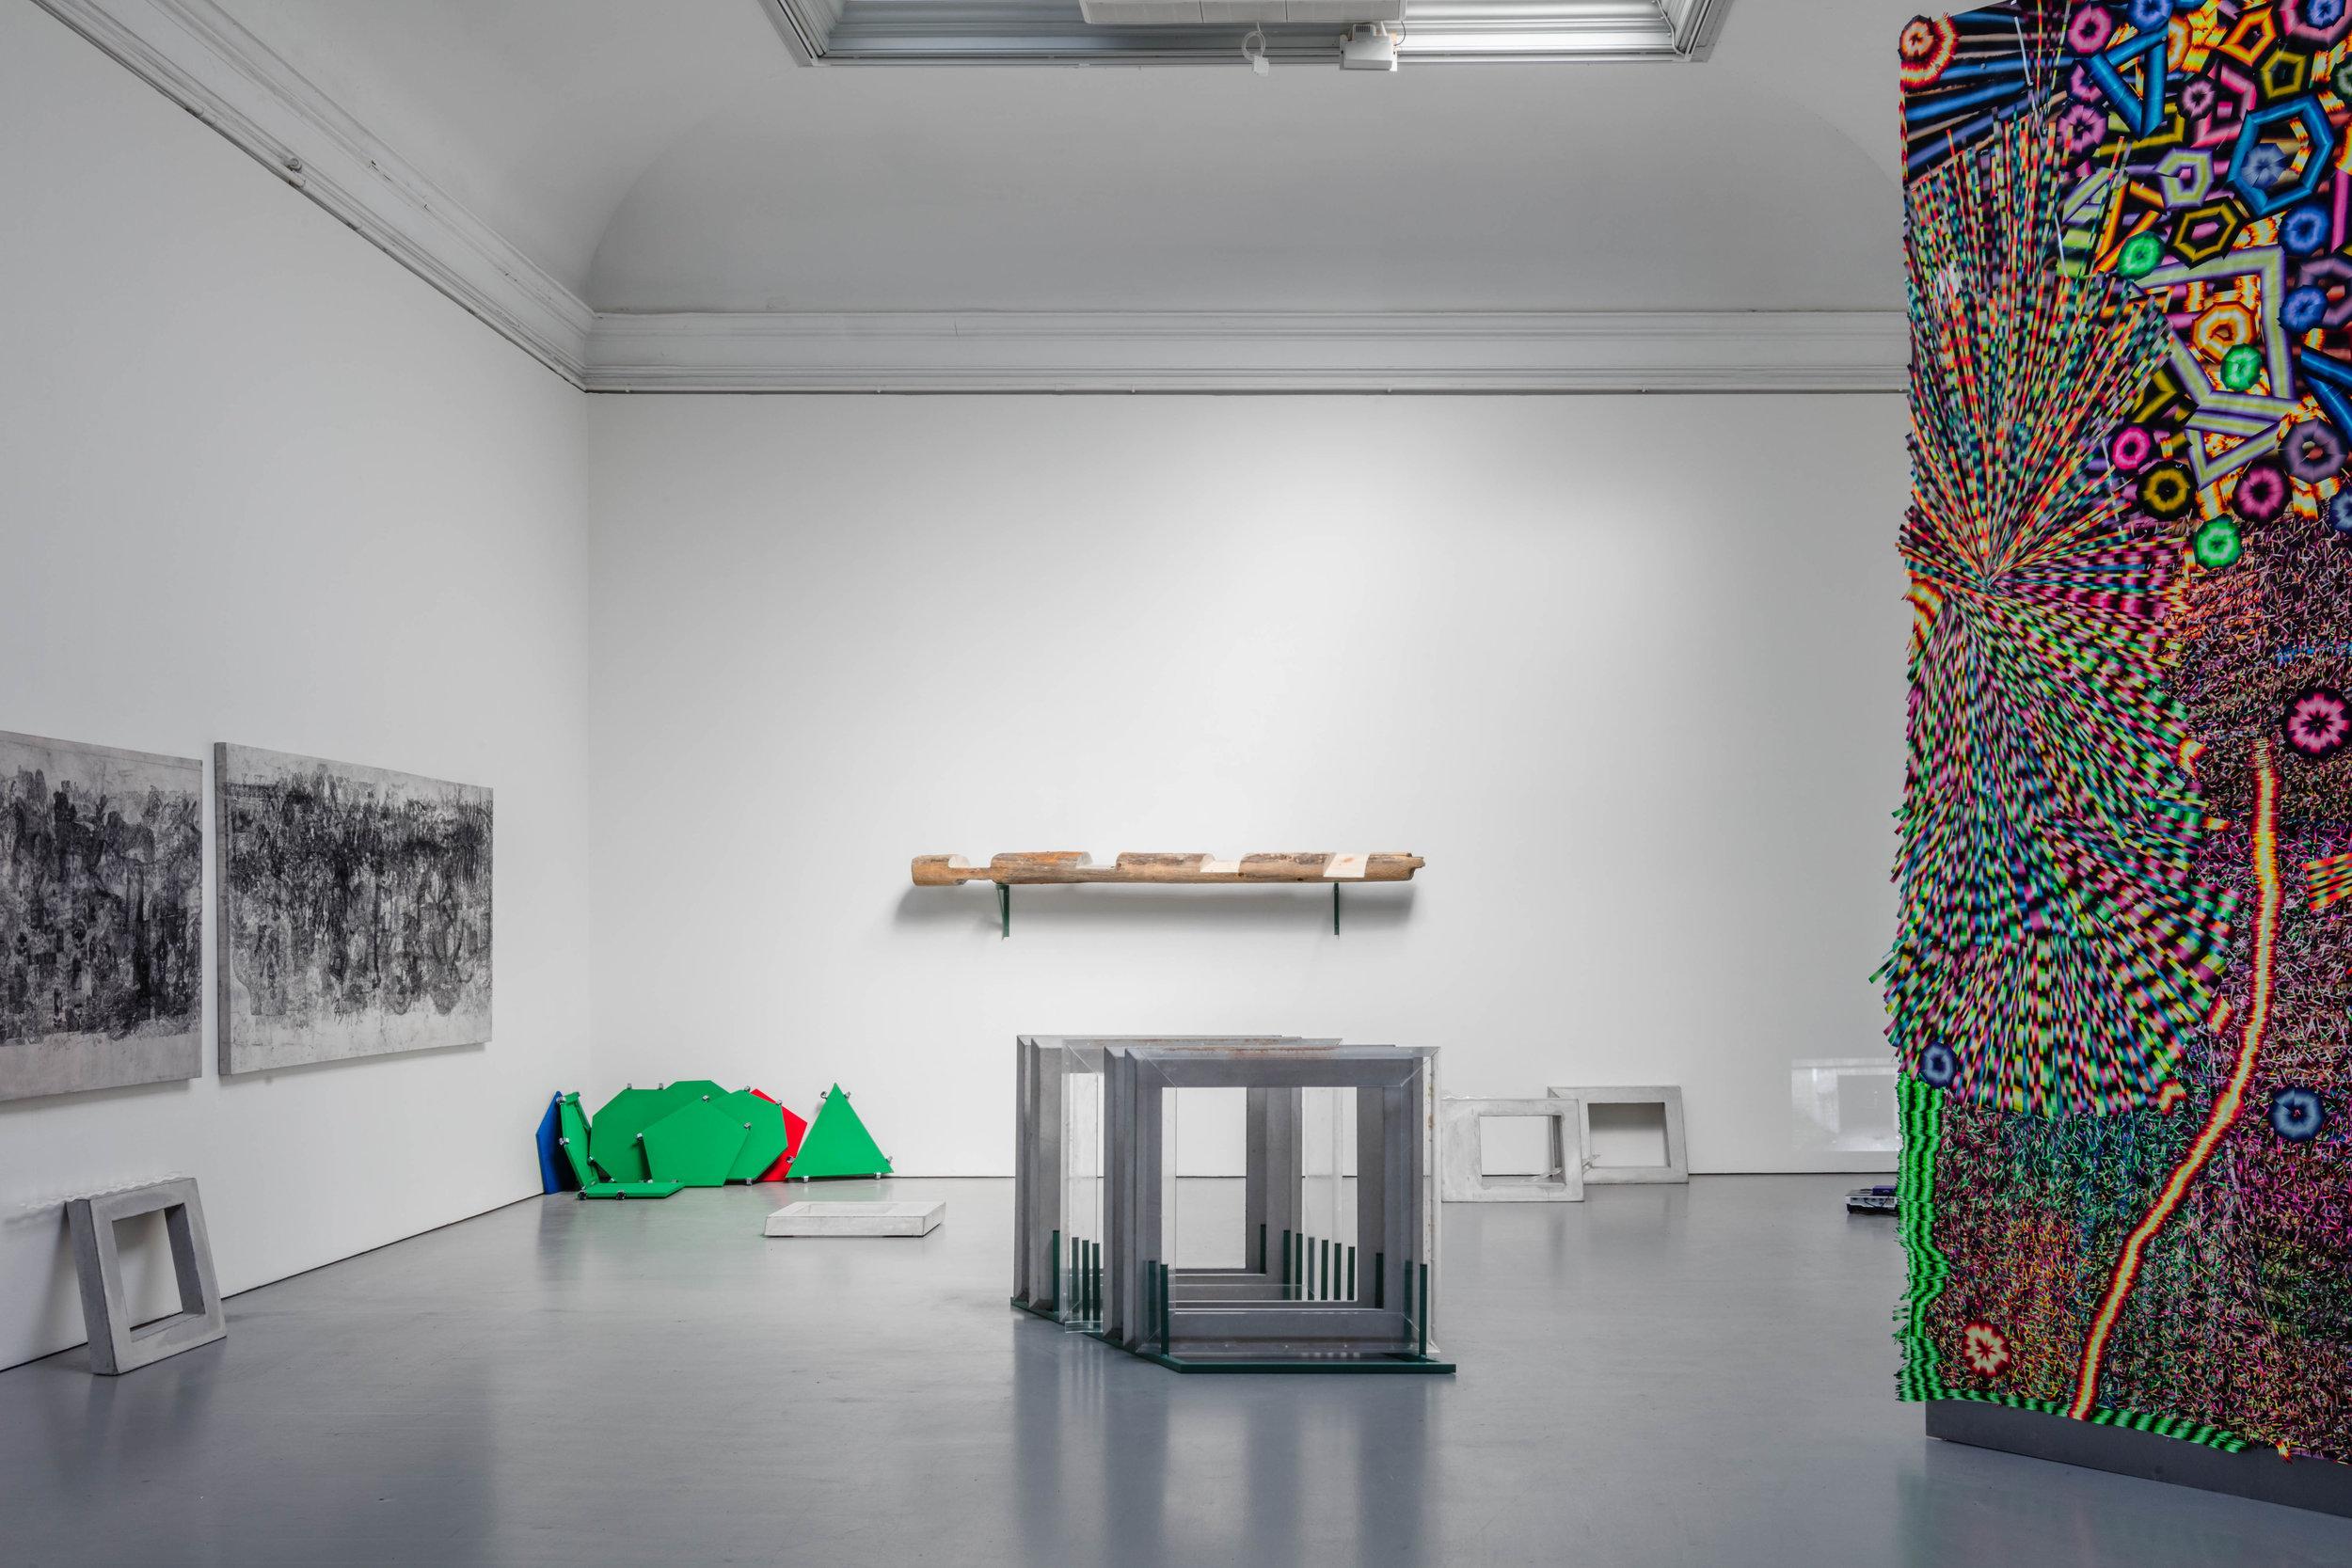 Paintings on left: Anna Engver (https://annaengver.com/), partly visible installation on right: Olivia Petterson Fleur (https://www.kkh.se/people/olivia-fleur/)